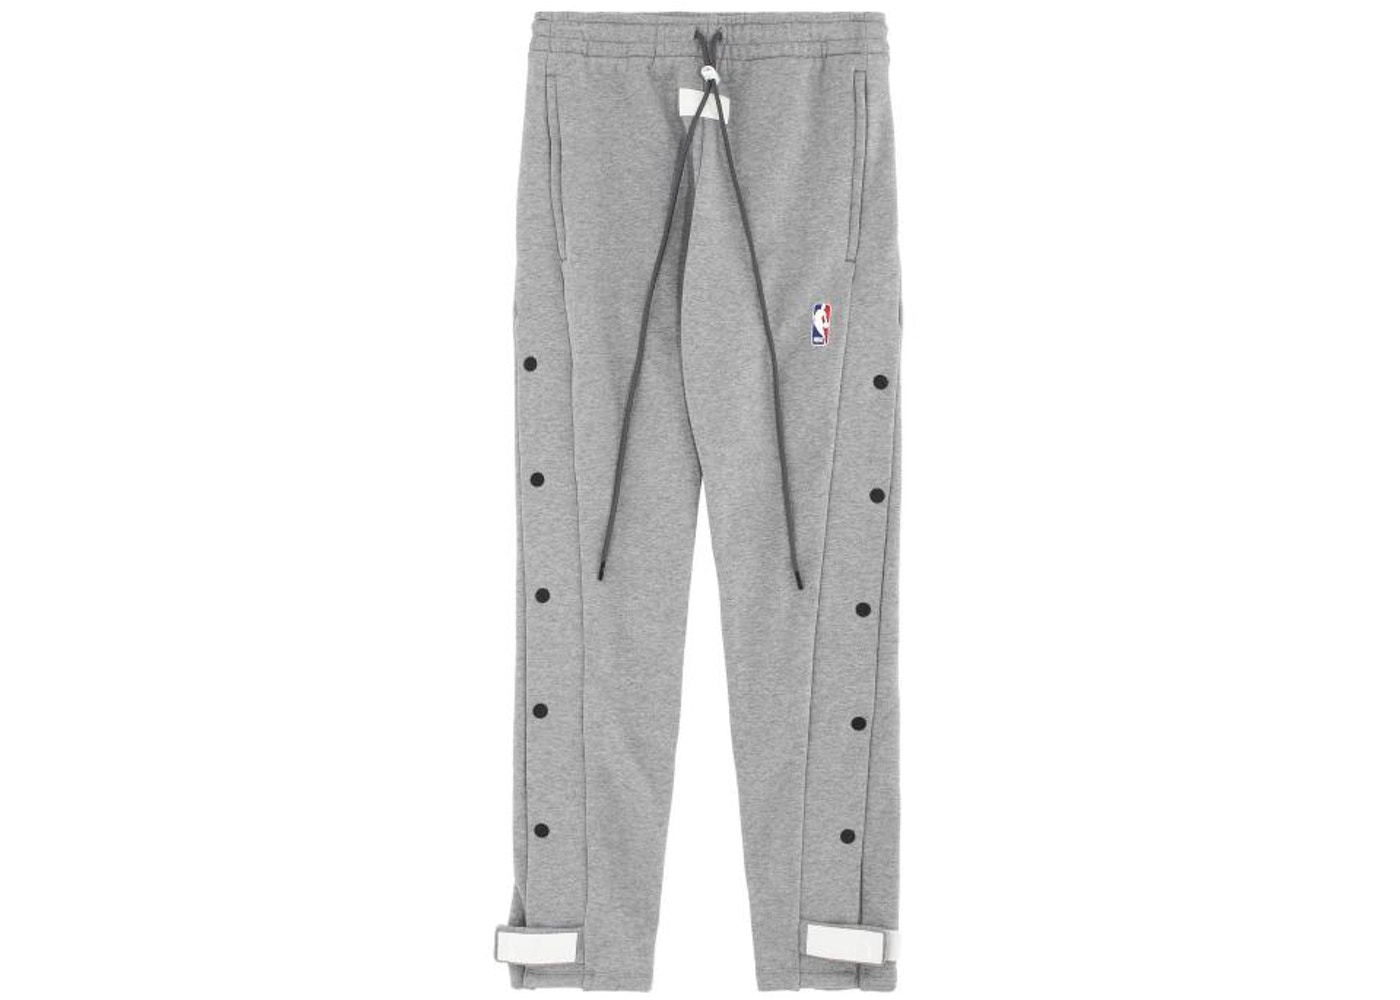 nike pants grey